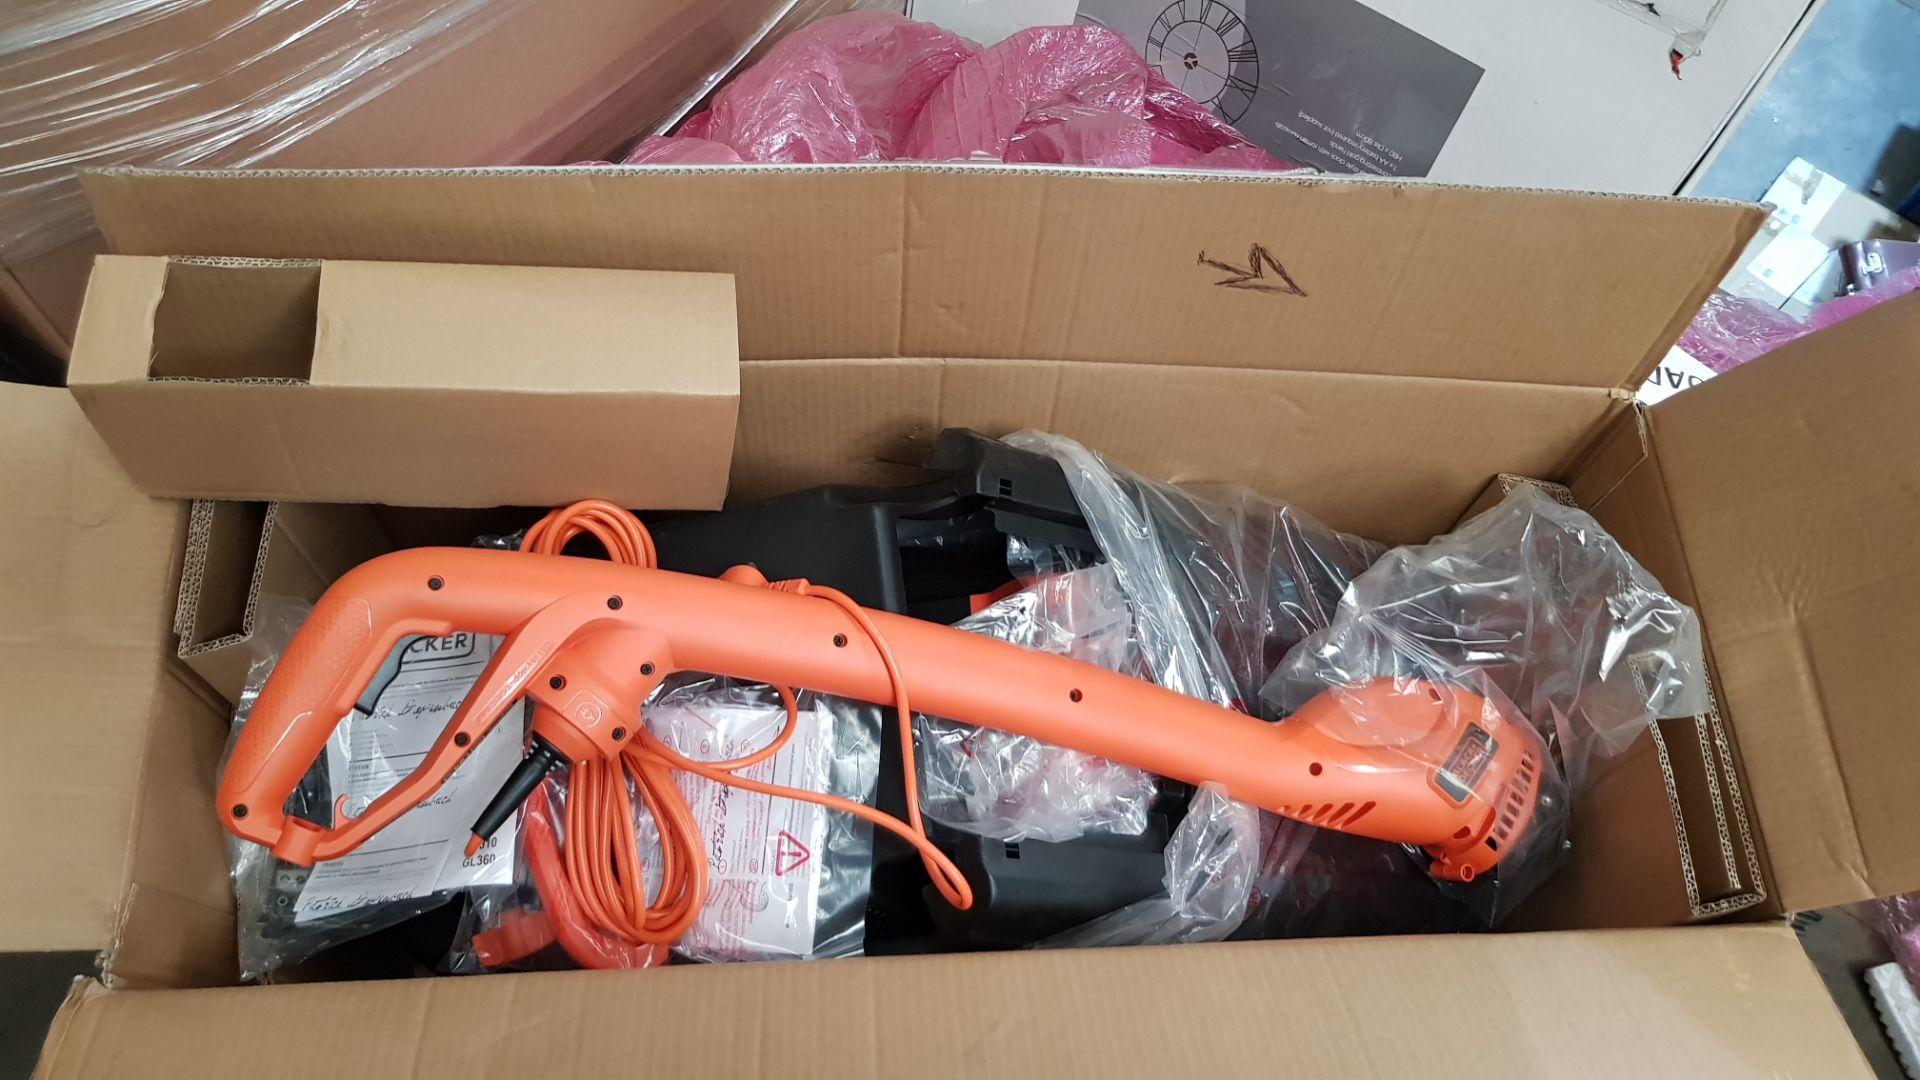 (P2) 1x Black & Decker 32cm 1000W Corded Lawn Mower & Strimmer RRP £99. Contents Appear Clean, Unu - Image 4 of 5